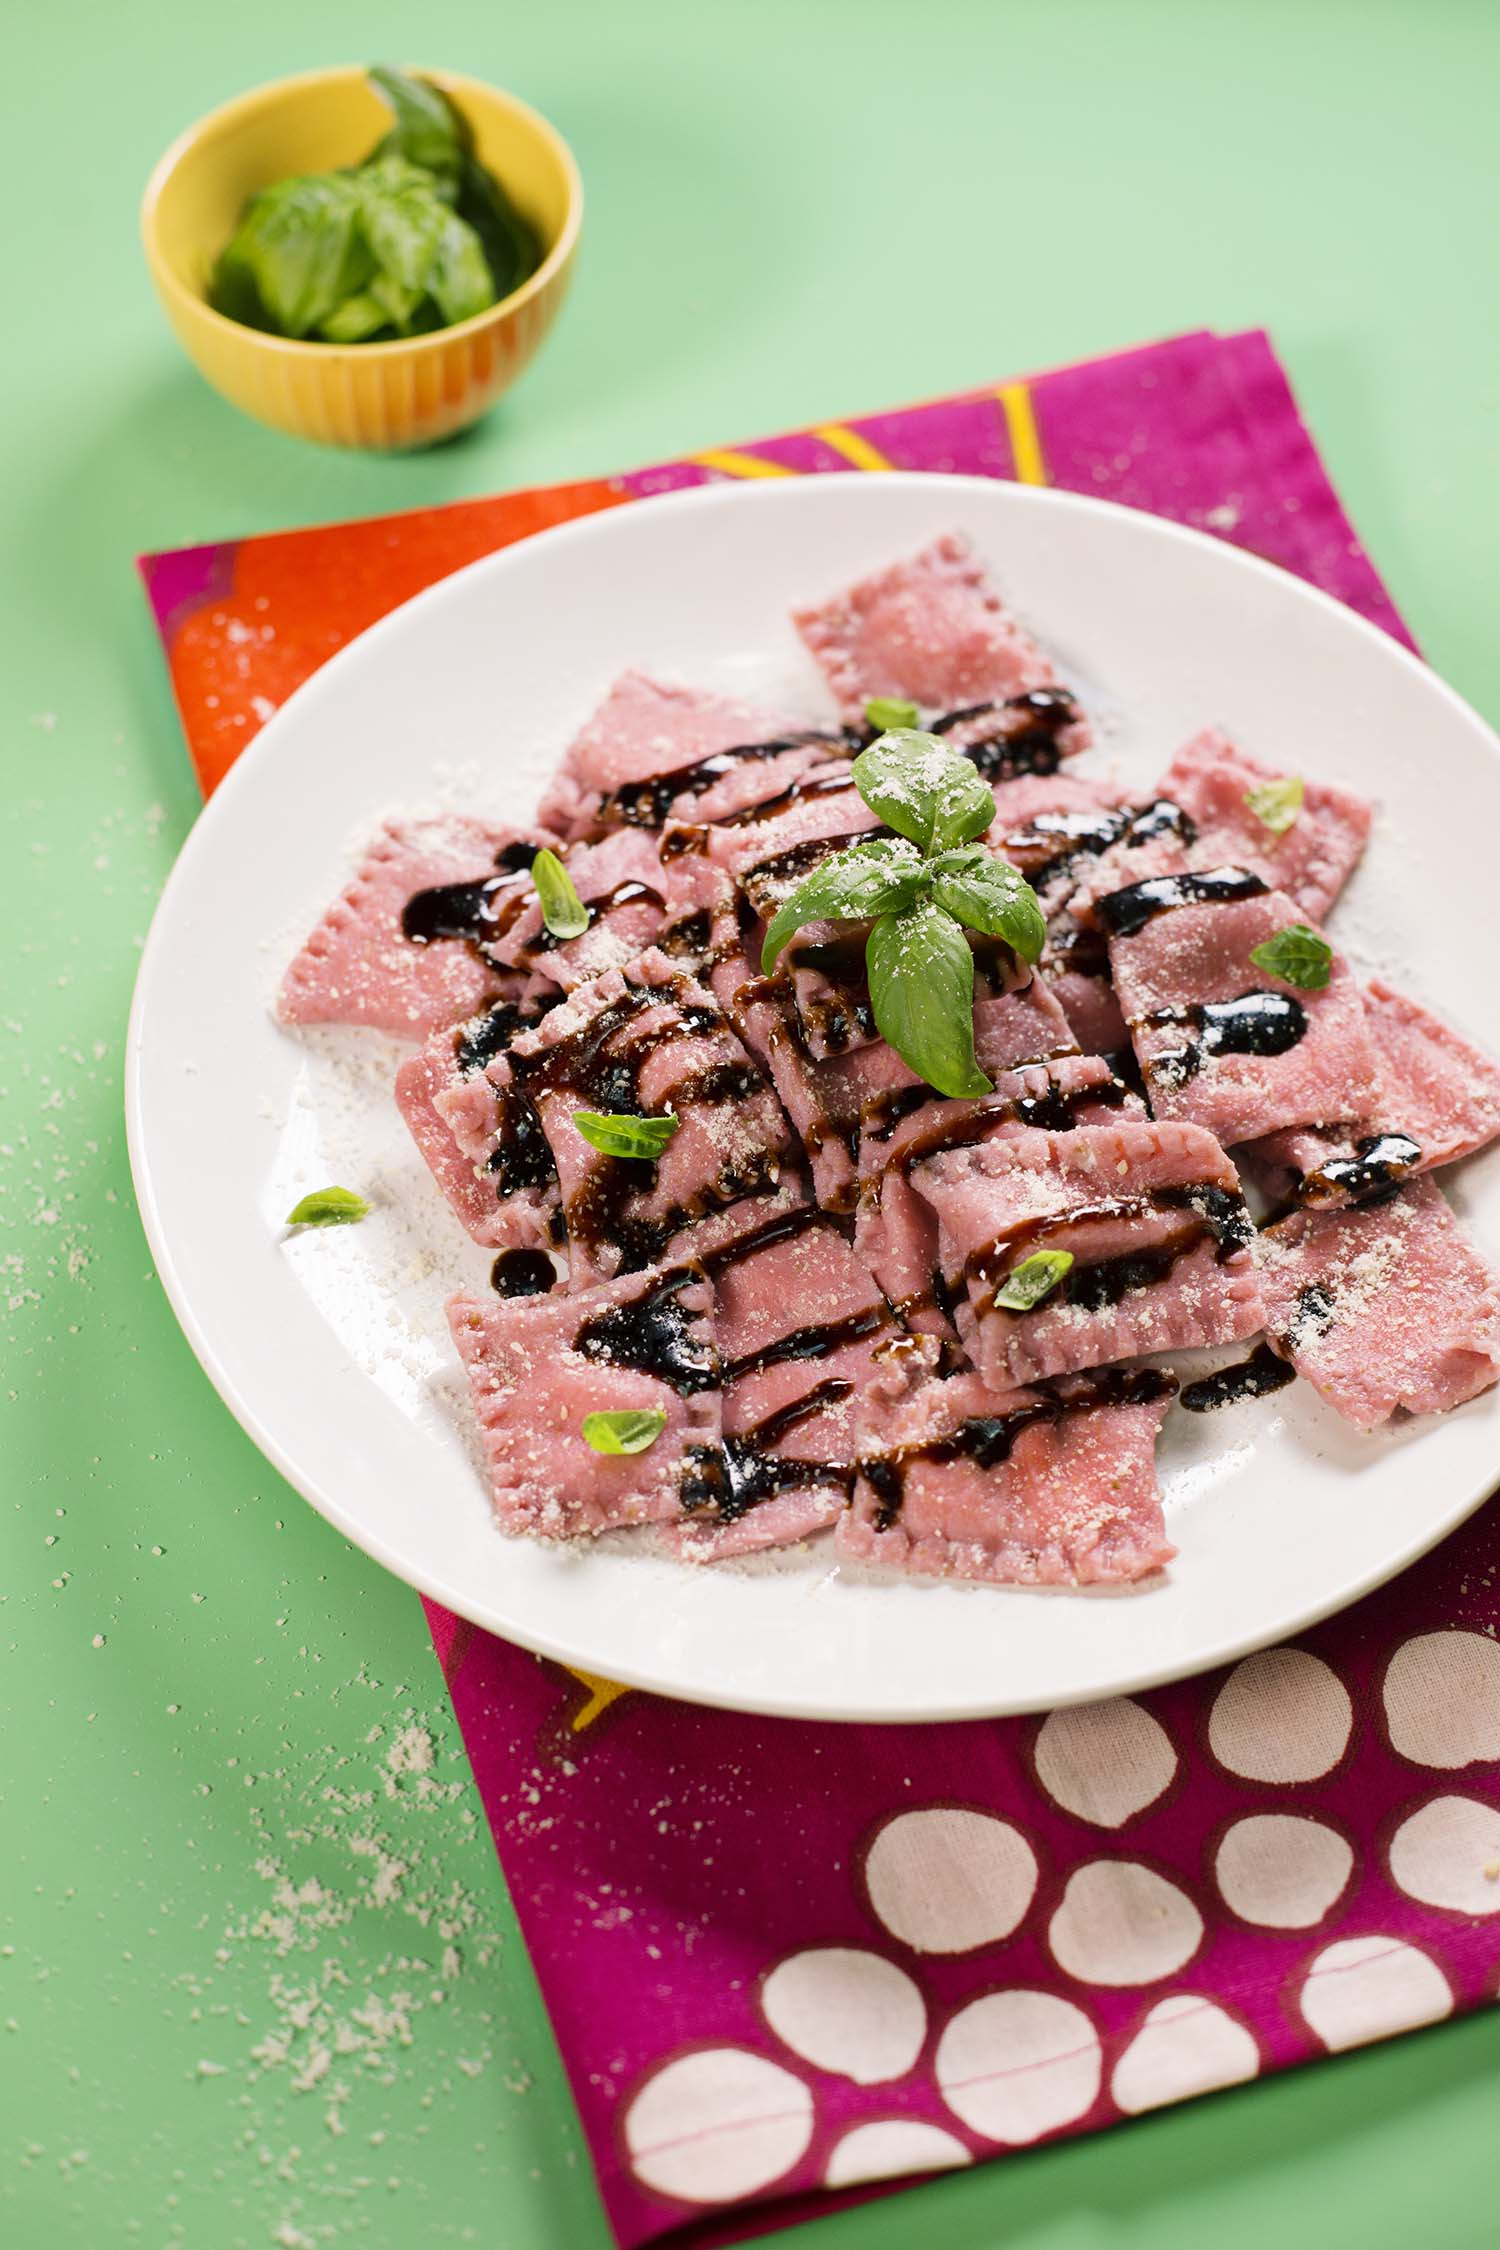 Strawberry Ravioli with Balsamic and Basil (via abeautifulmess.com)